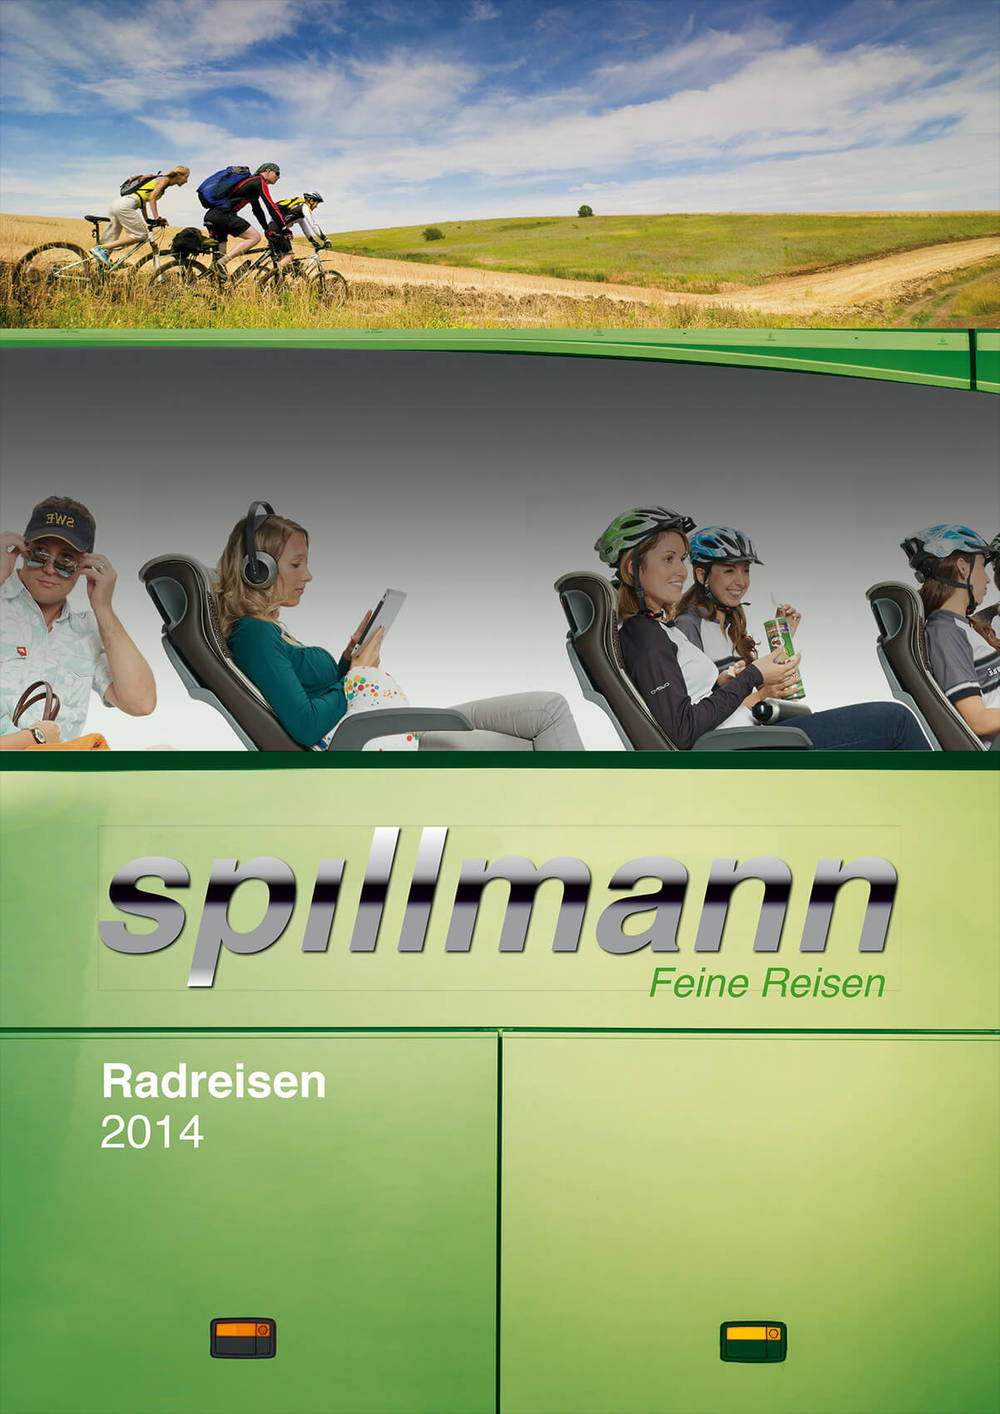 rad-reisekatalog-spillmann-agentur-intermar-corporate.jpg